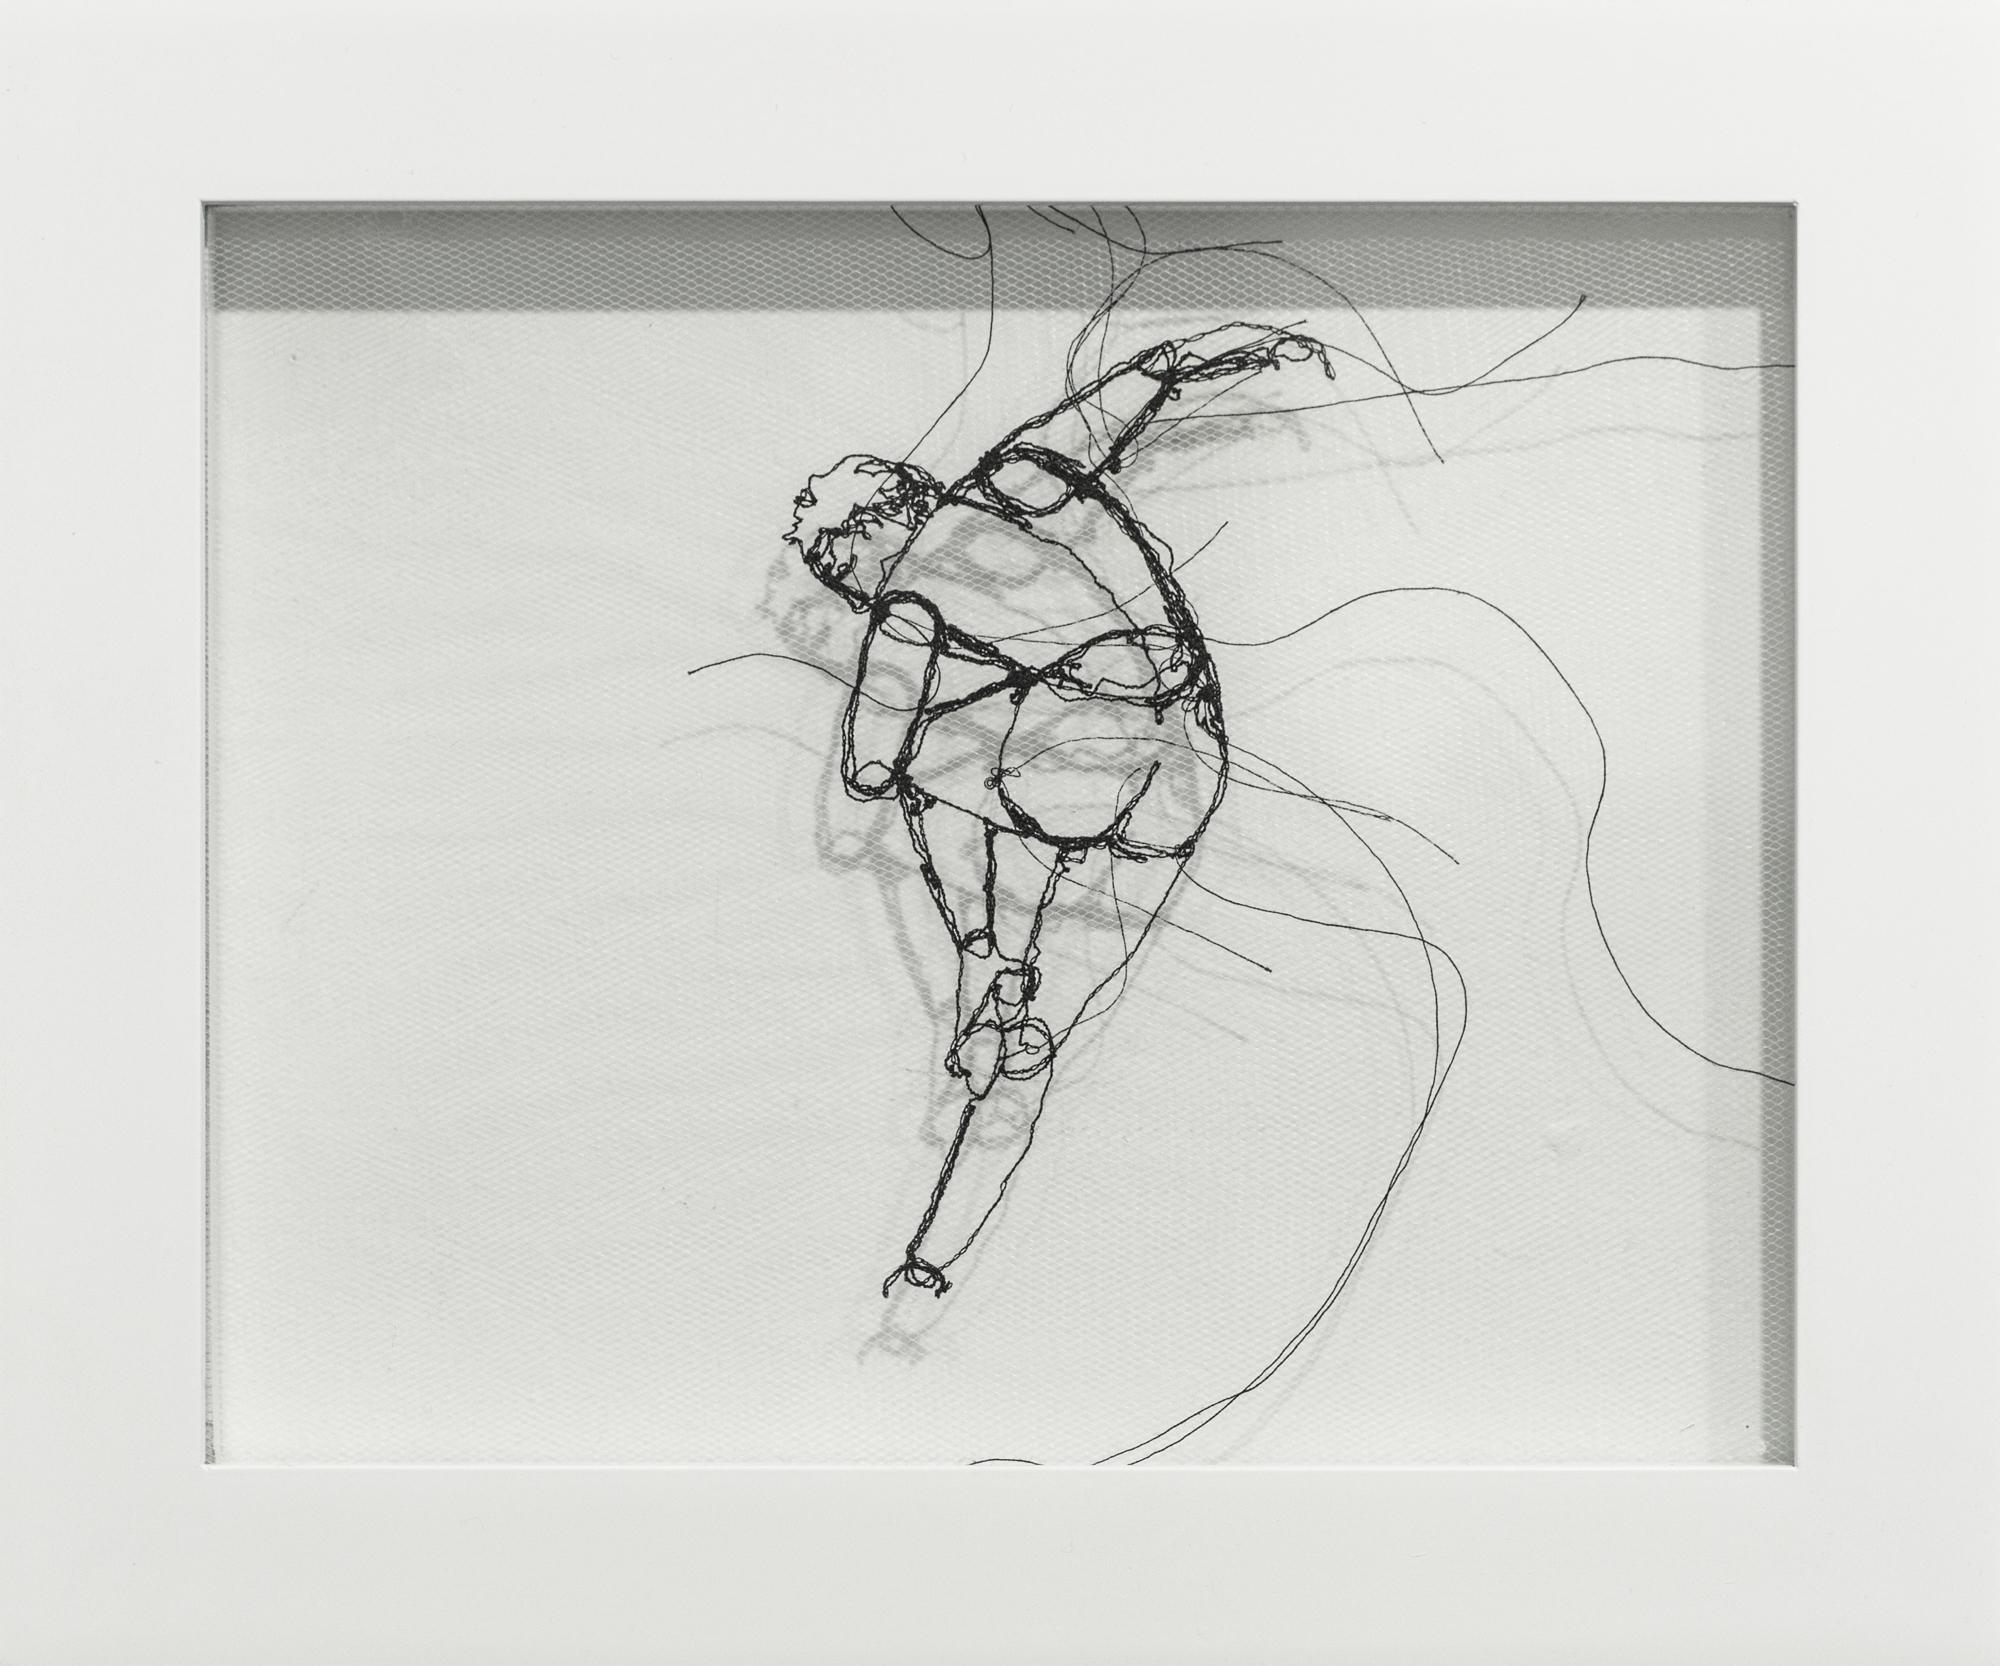 """Freemotion II"", Fiber Art, Figurative, Nude Dancer, Dancing, Thread"